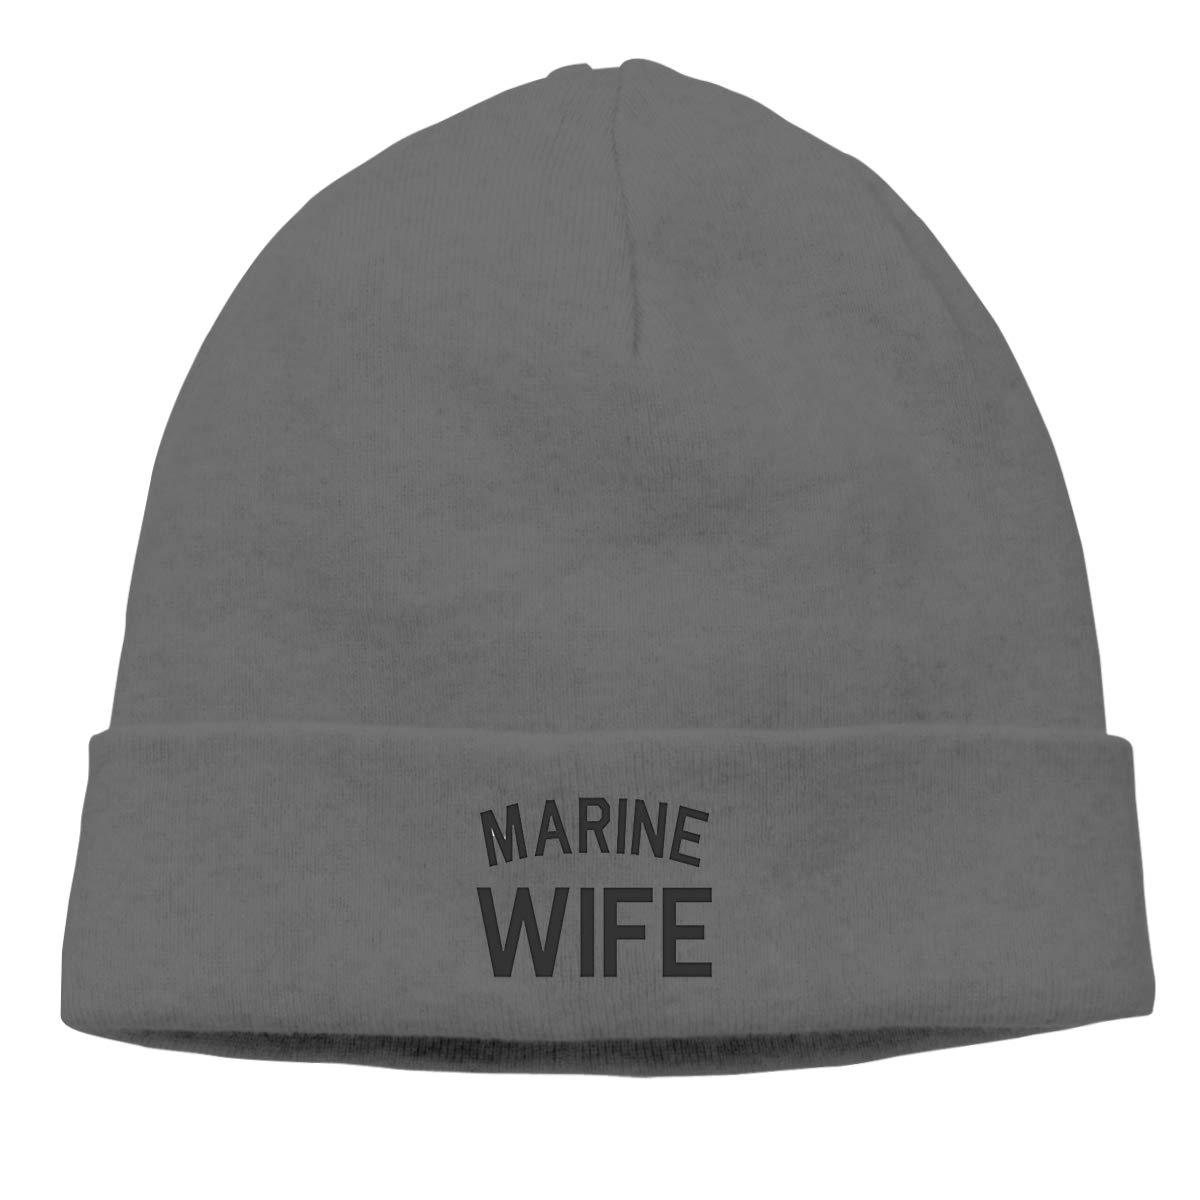 Nskngr Marine Wife Cap Men Women Lightweight Casual Slouch Beanie Hats Ski Slouchy Hat